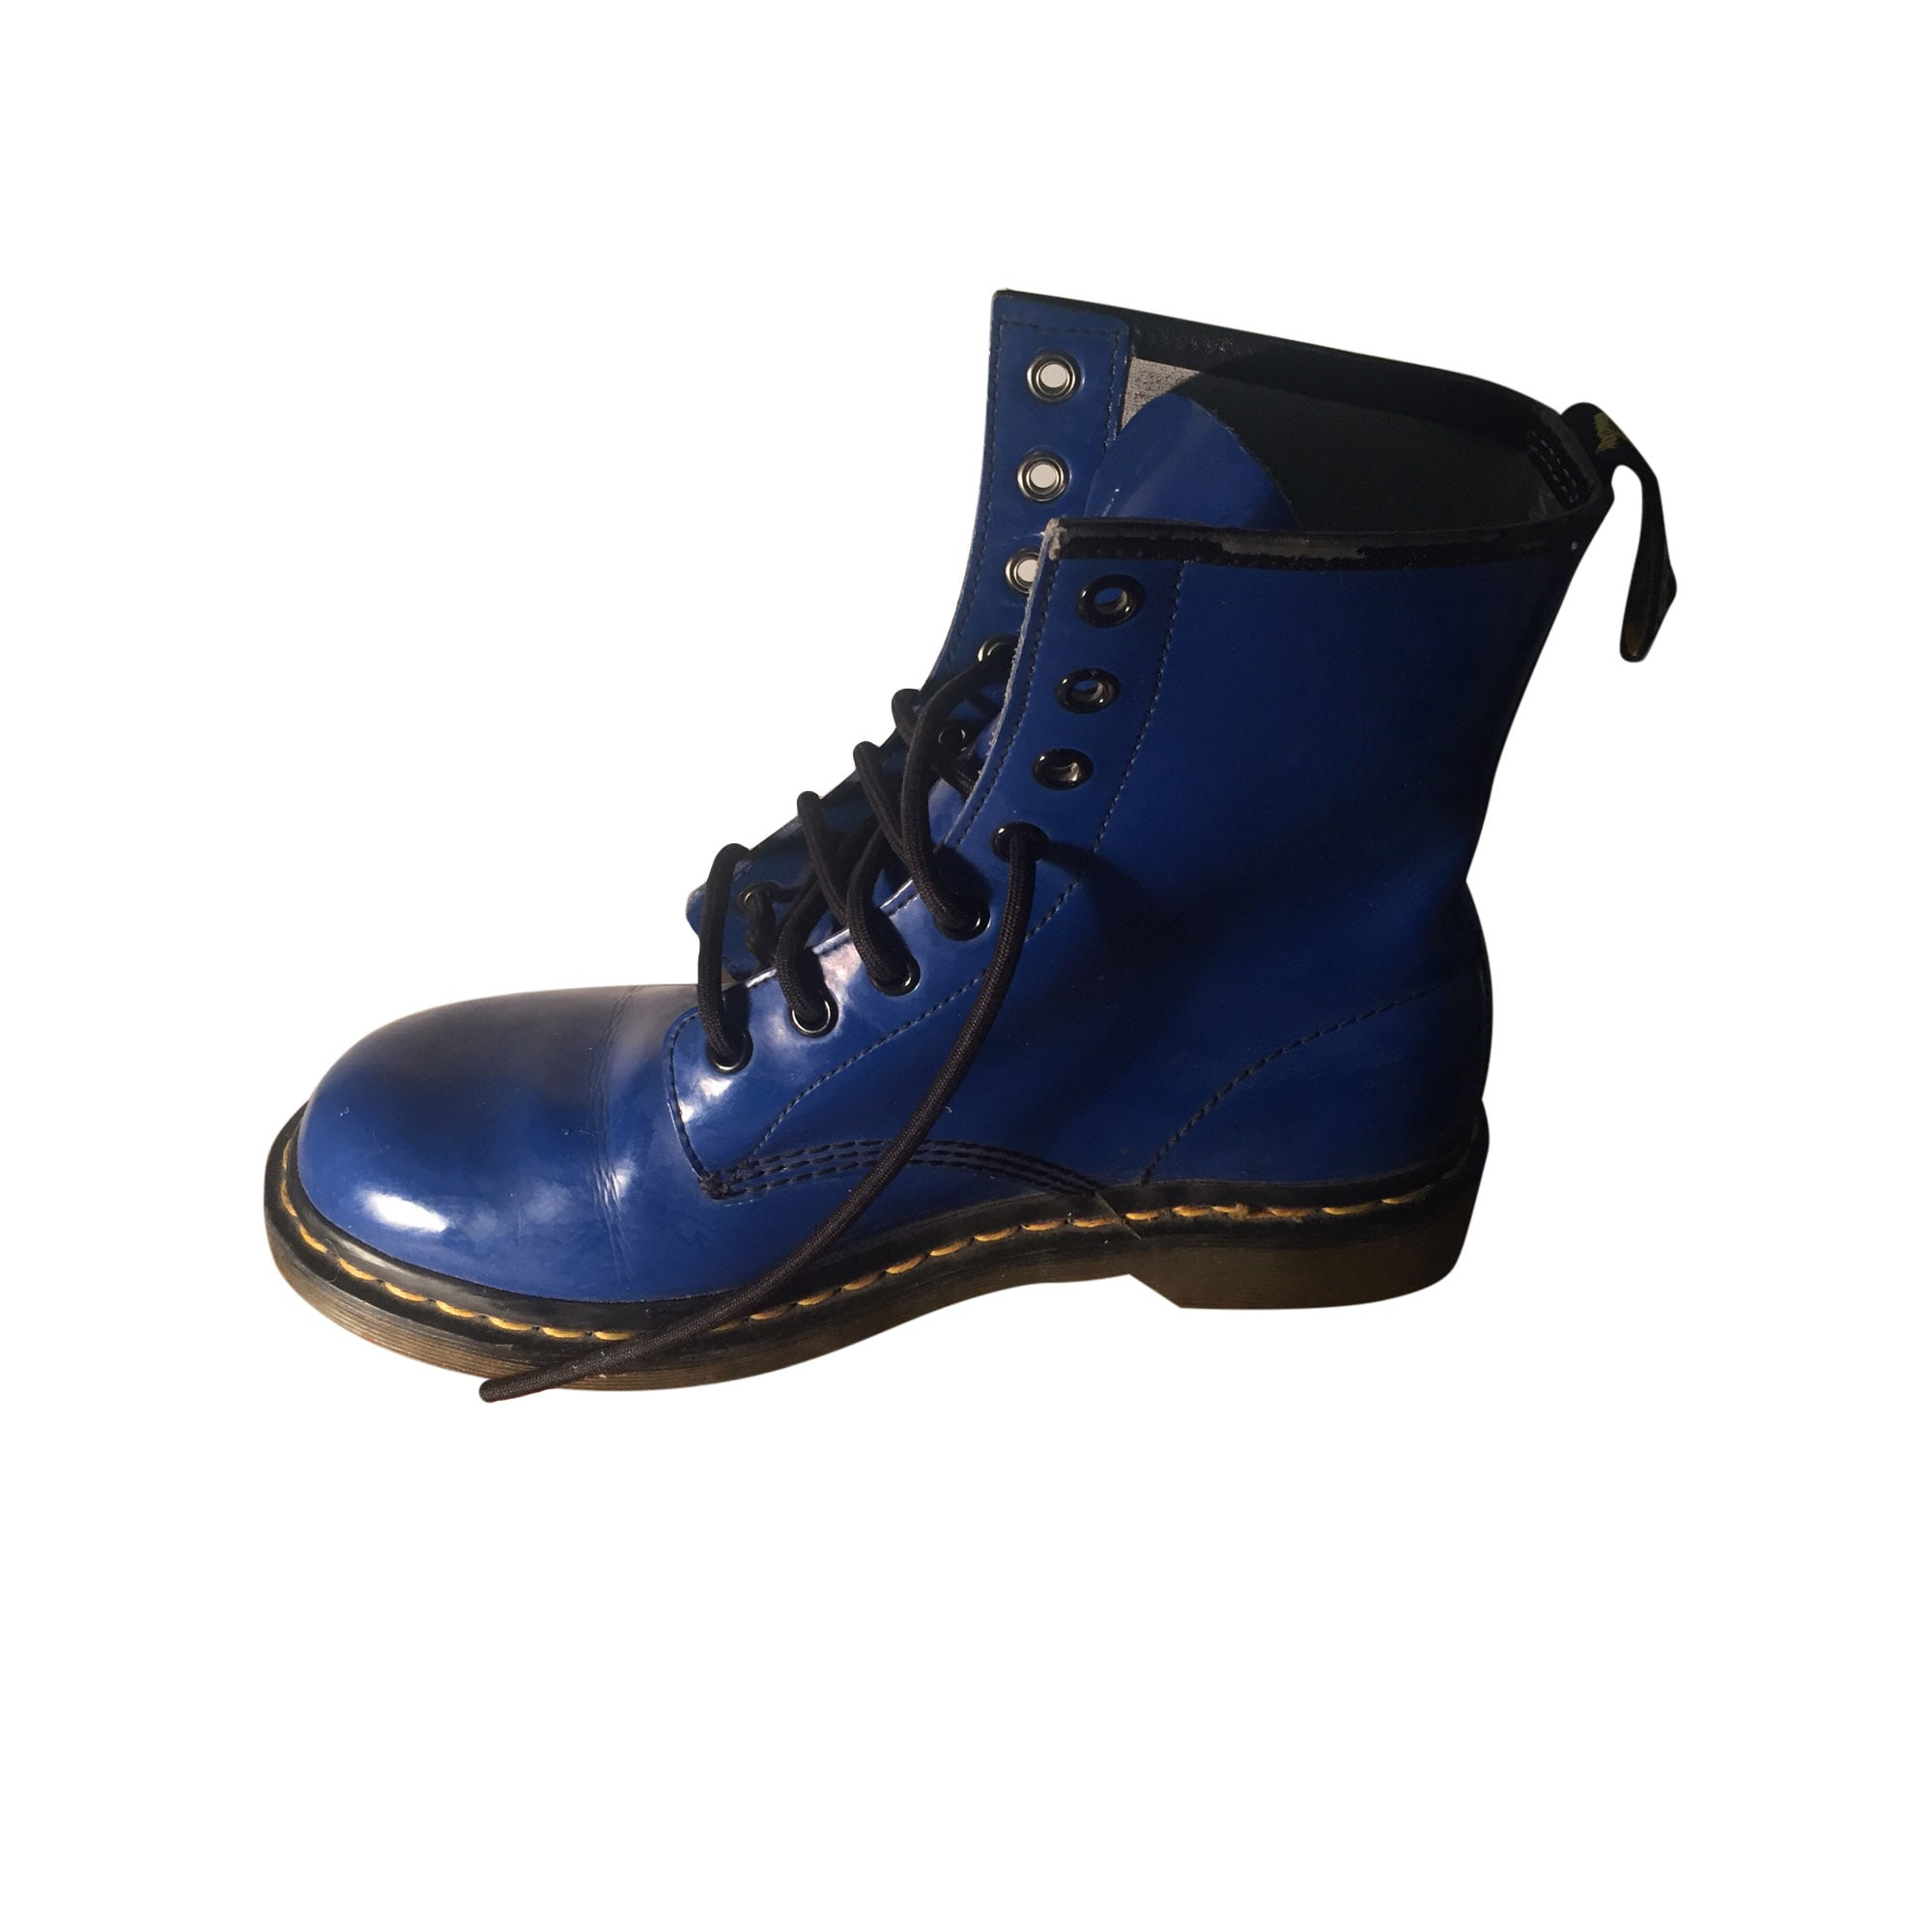 Dr 8254570 41 Martens Bleu Bottes Motards vRq5wqp